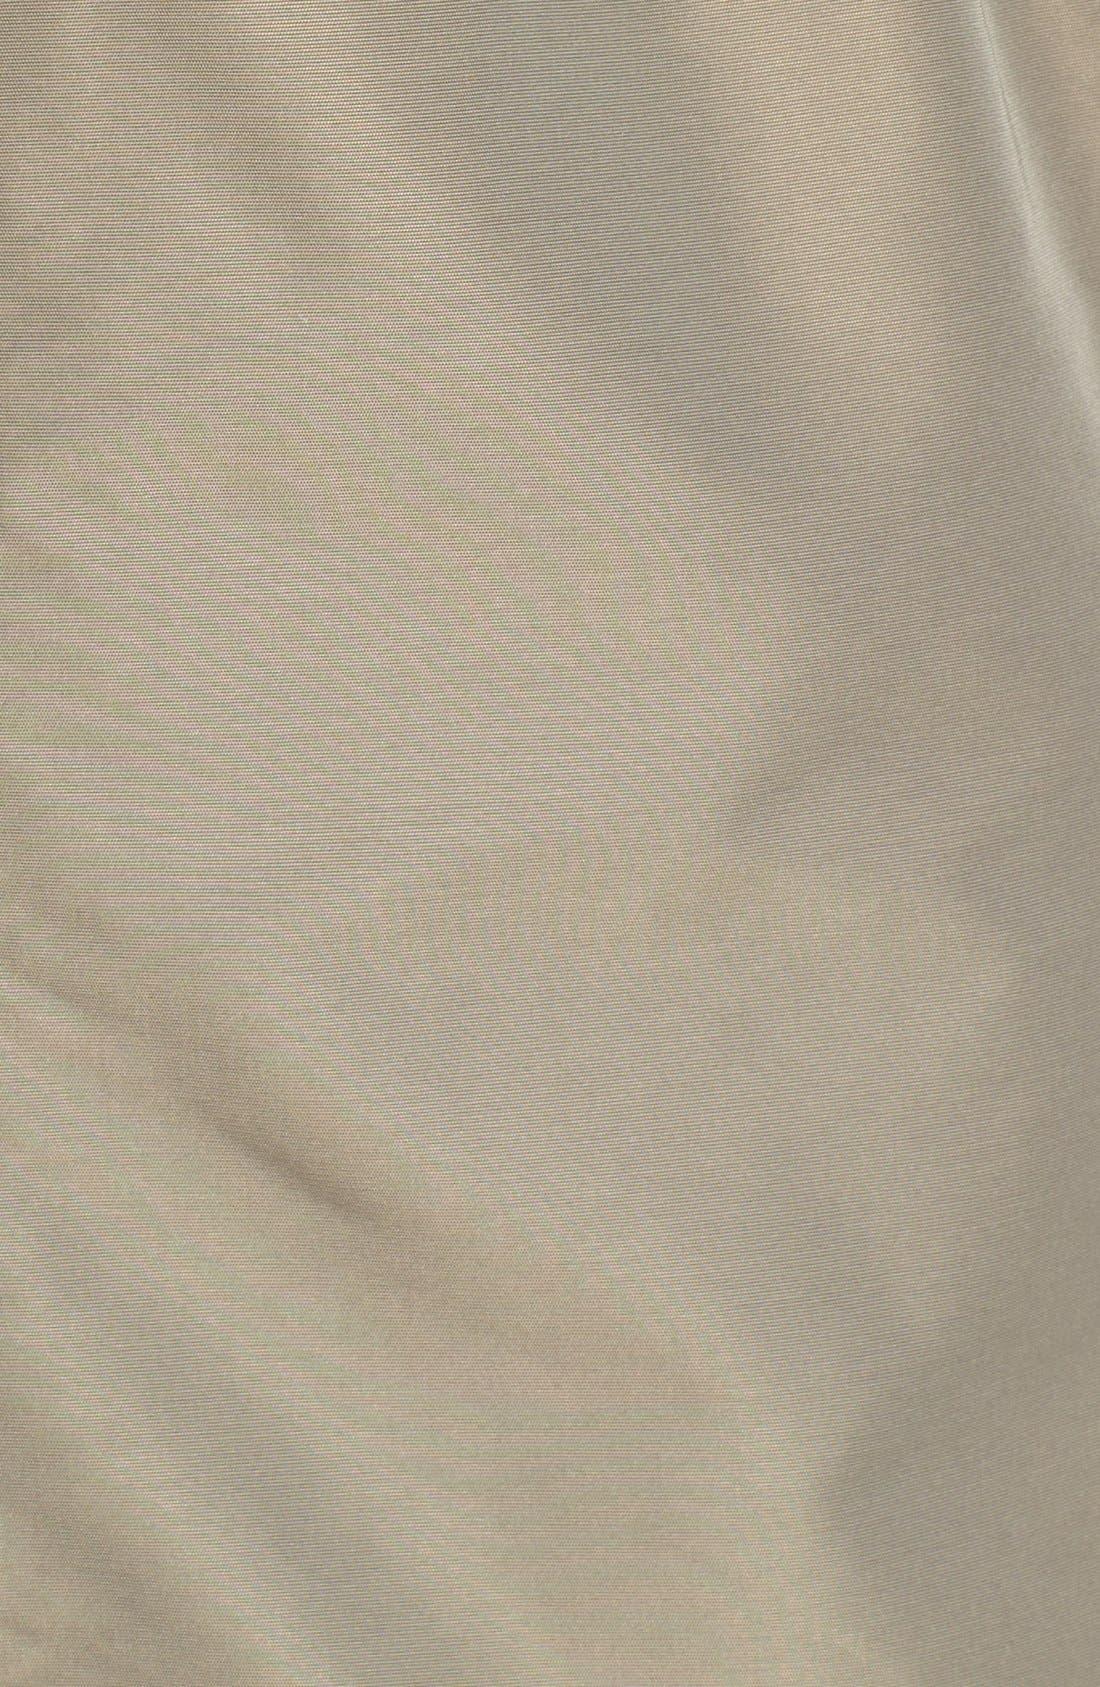 Alternate Image 3  - Burberry Brit 'Cobridge' Hooded Anorak with Detachable Liner